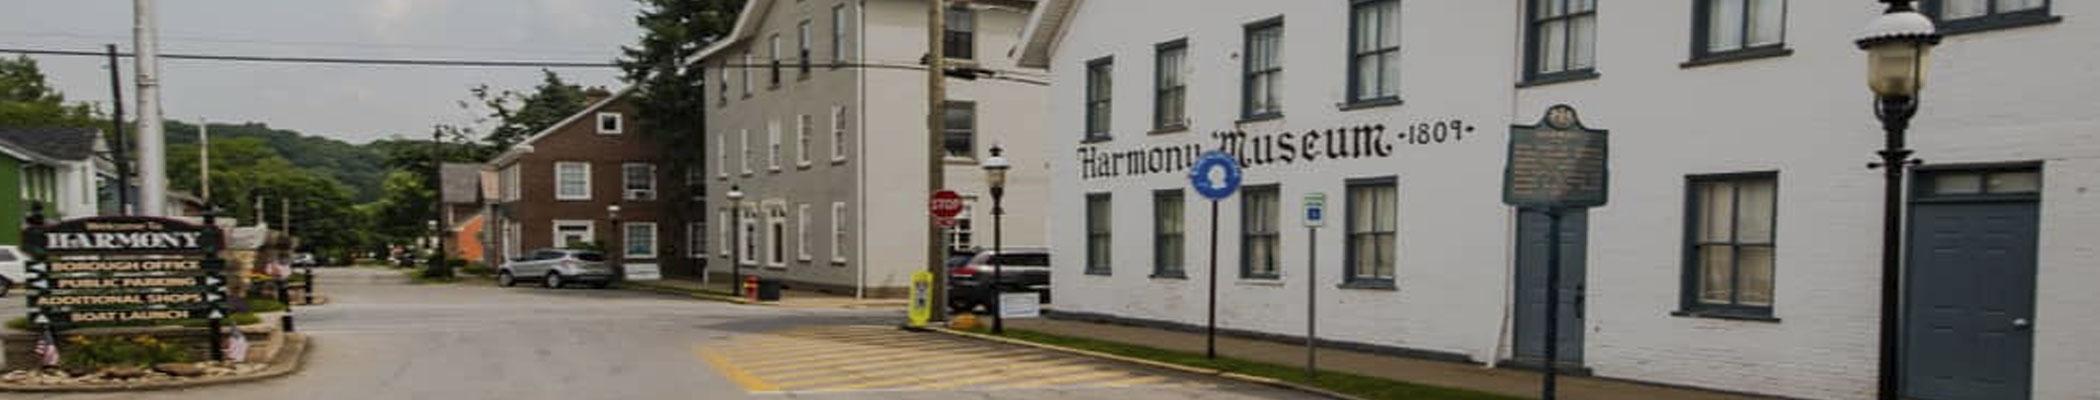 Harmony Museum banner